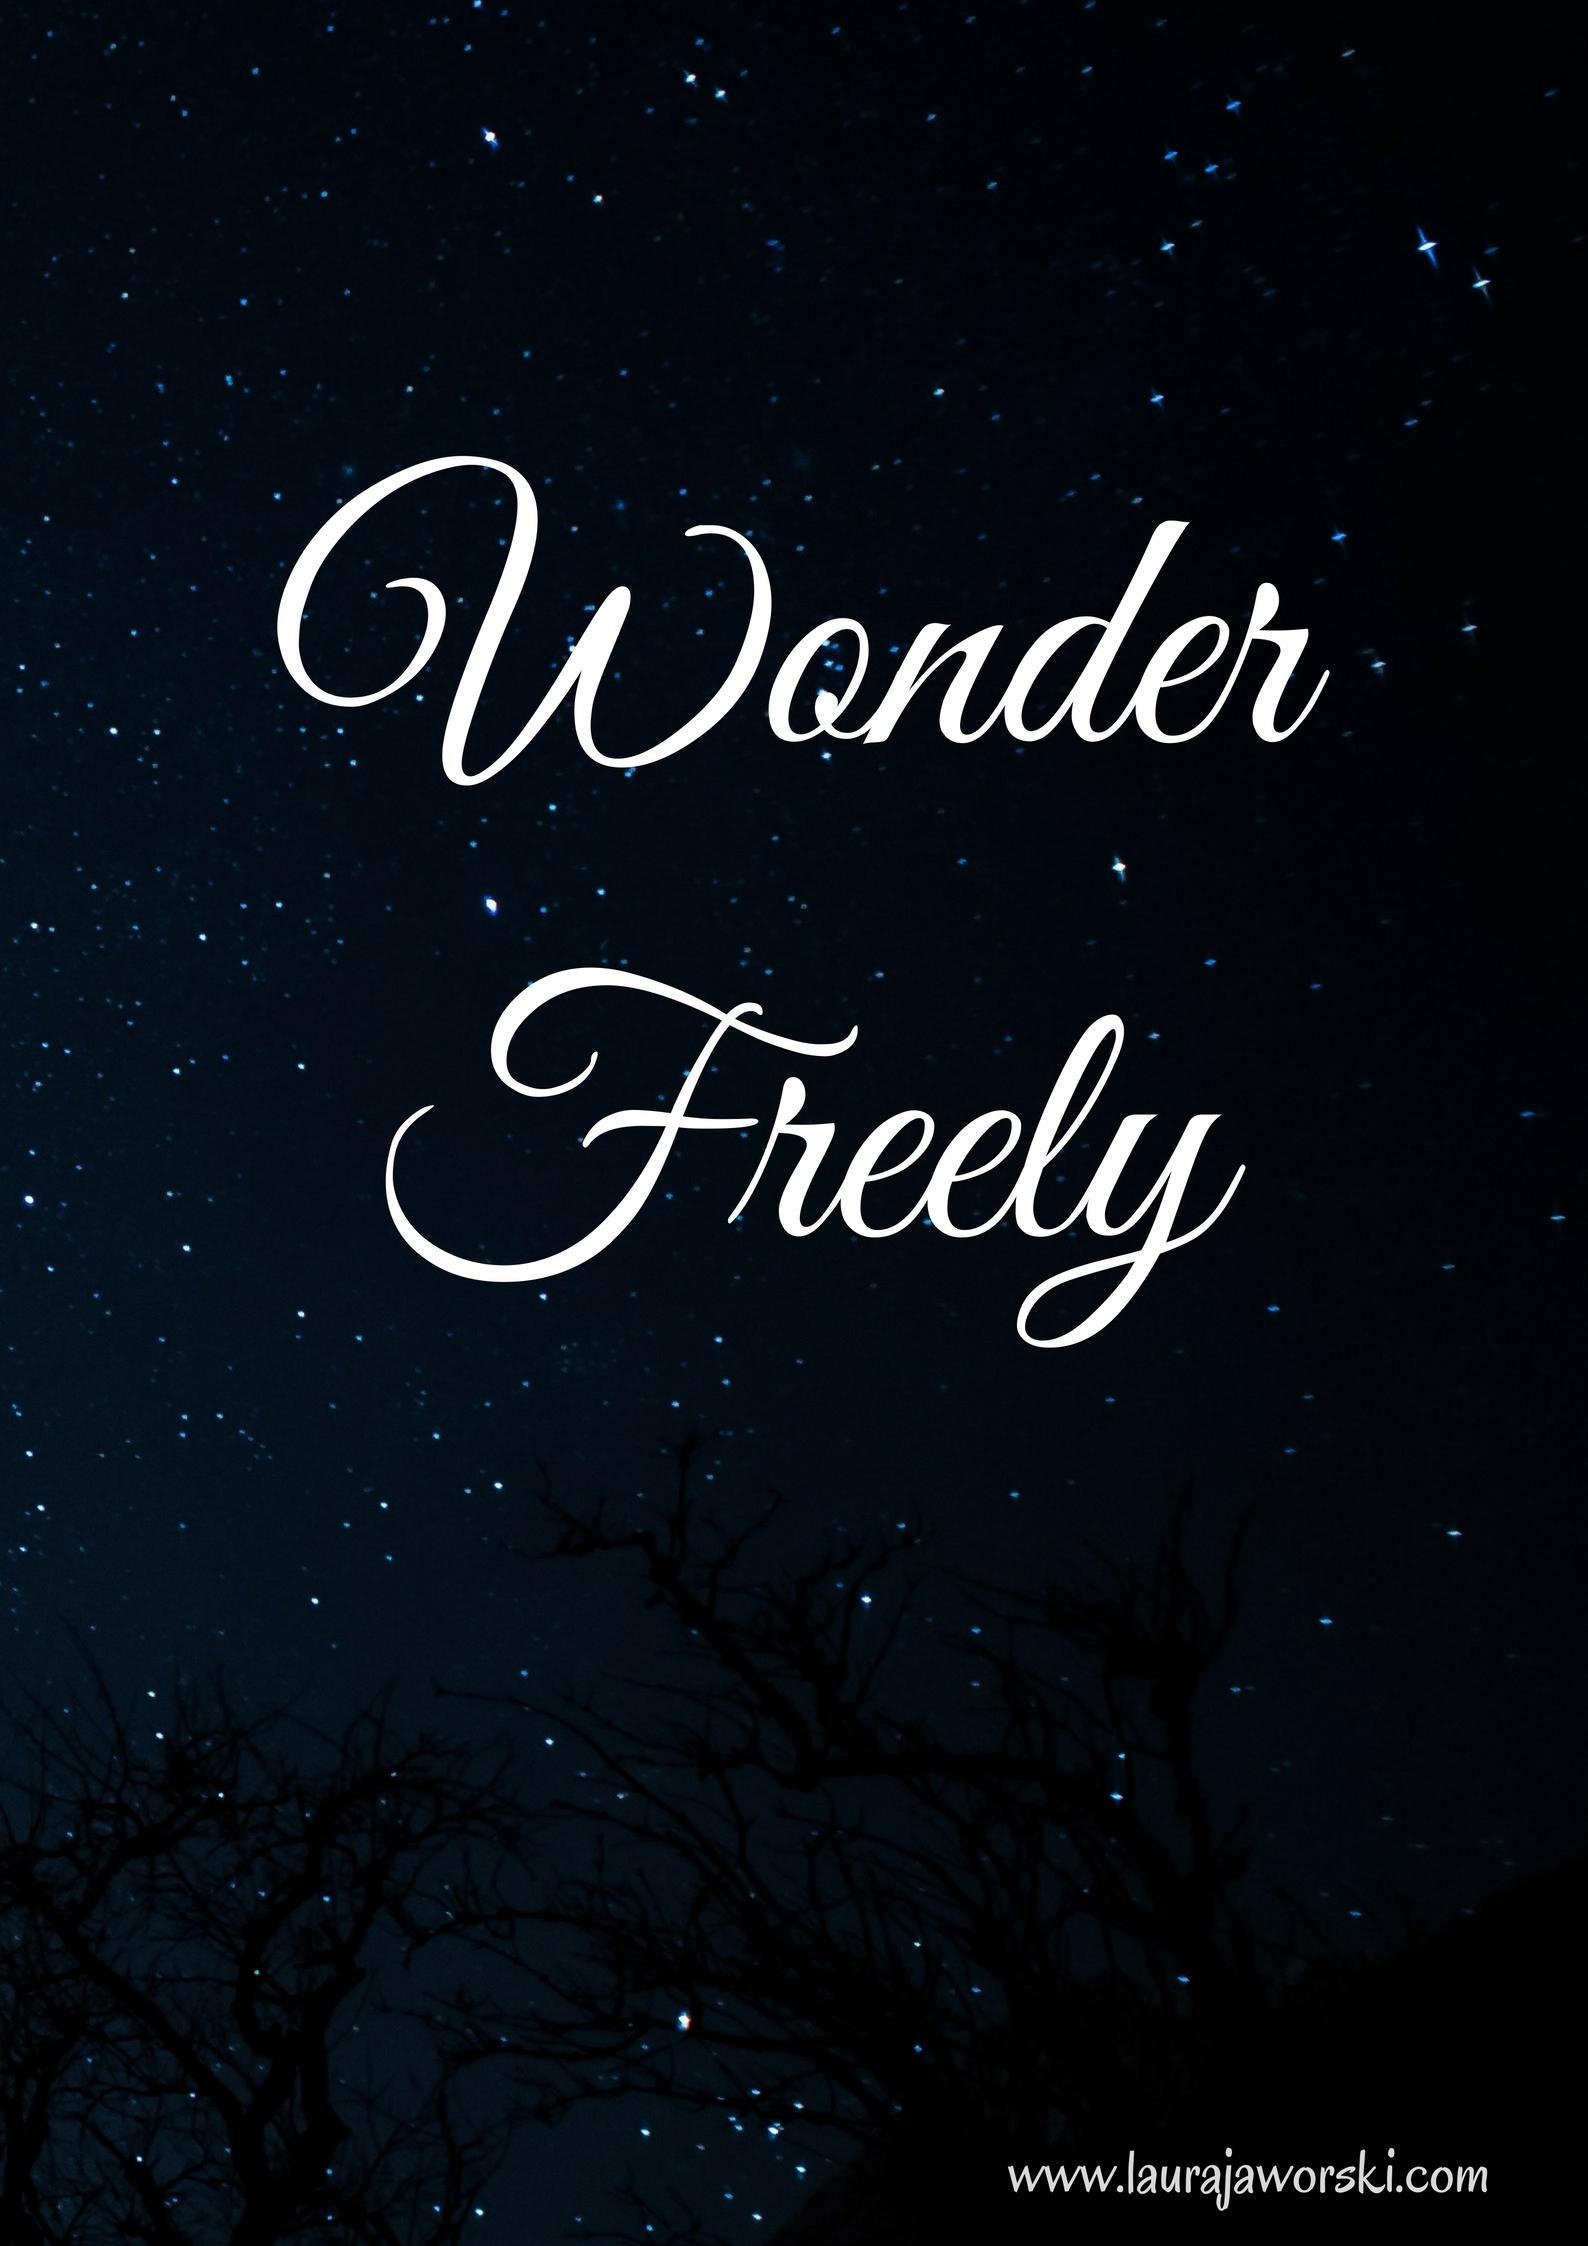 Wonder ♥ | www.laurajaworski.com